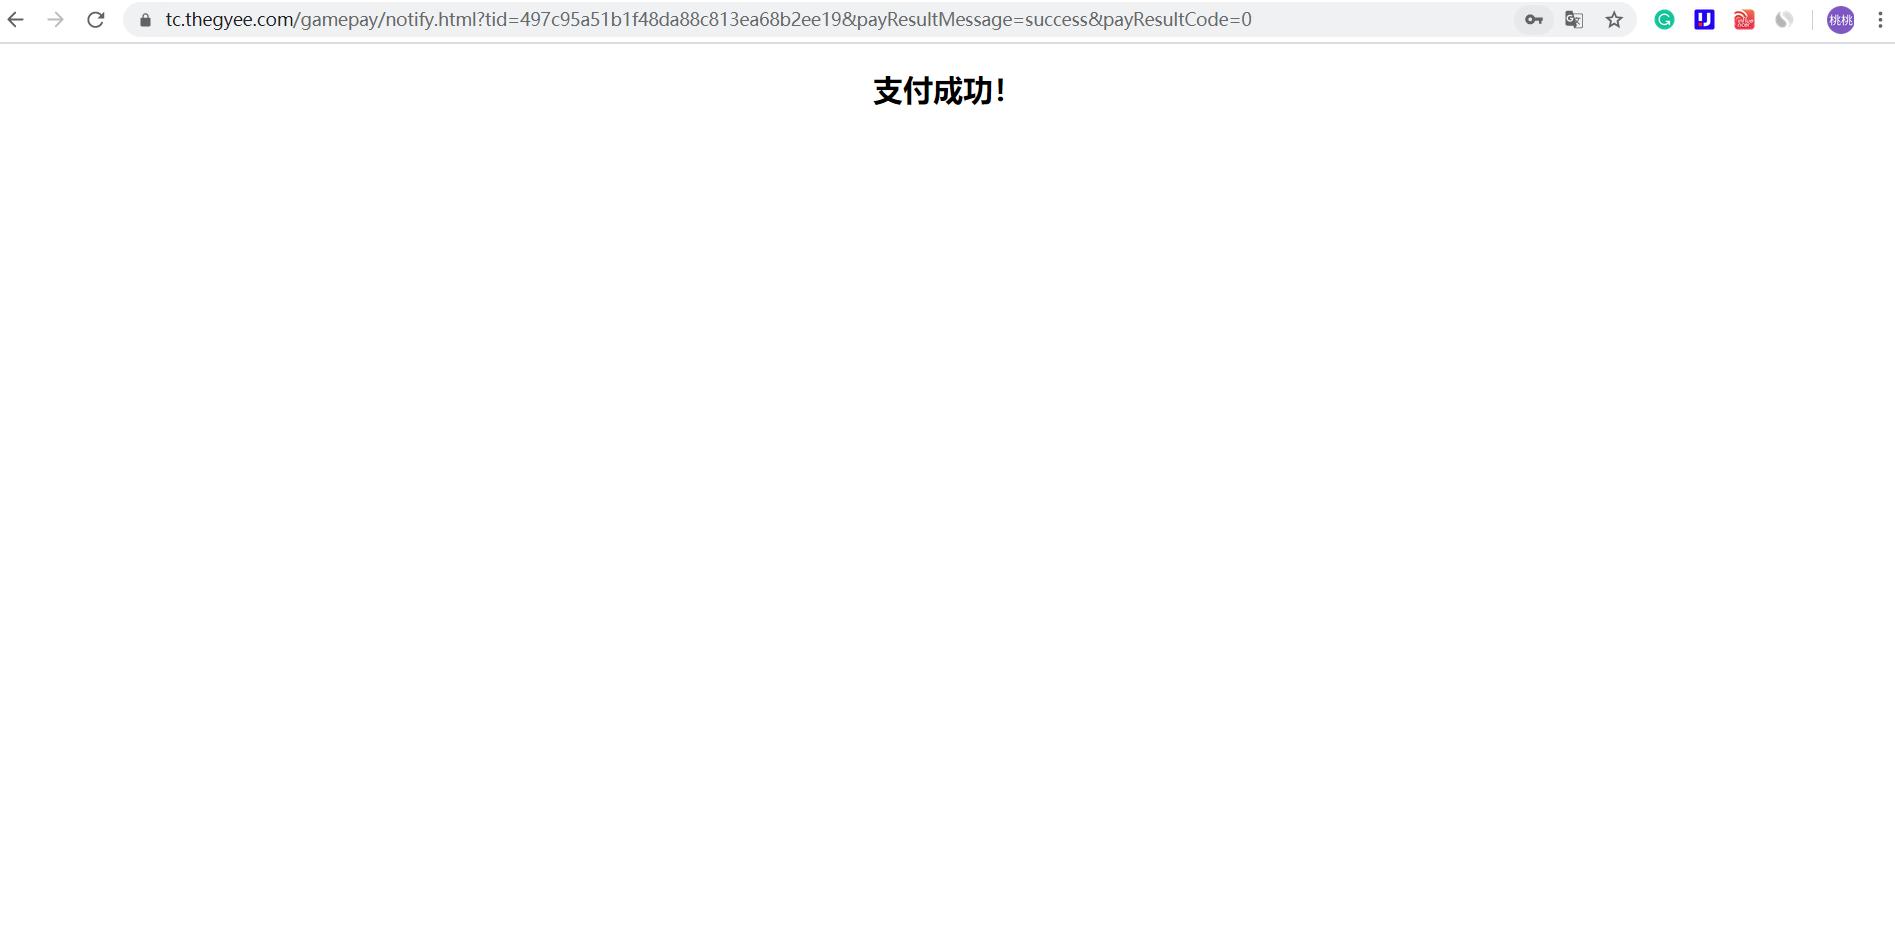 Mycard储值活动详细流程指南-支付成功.png